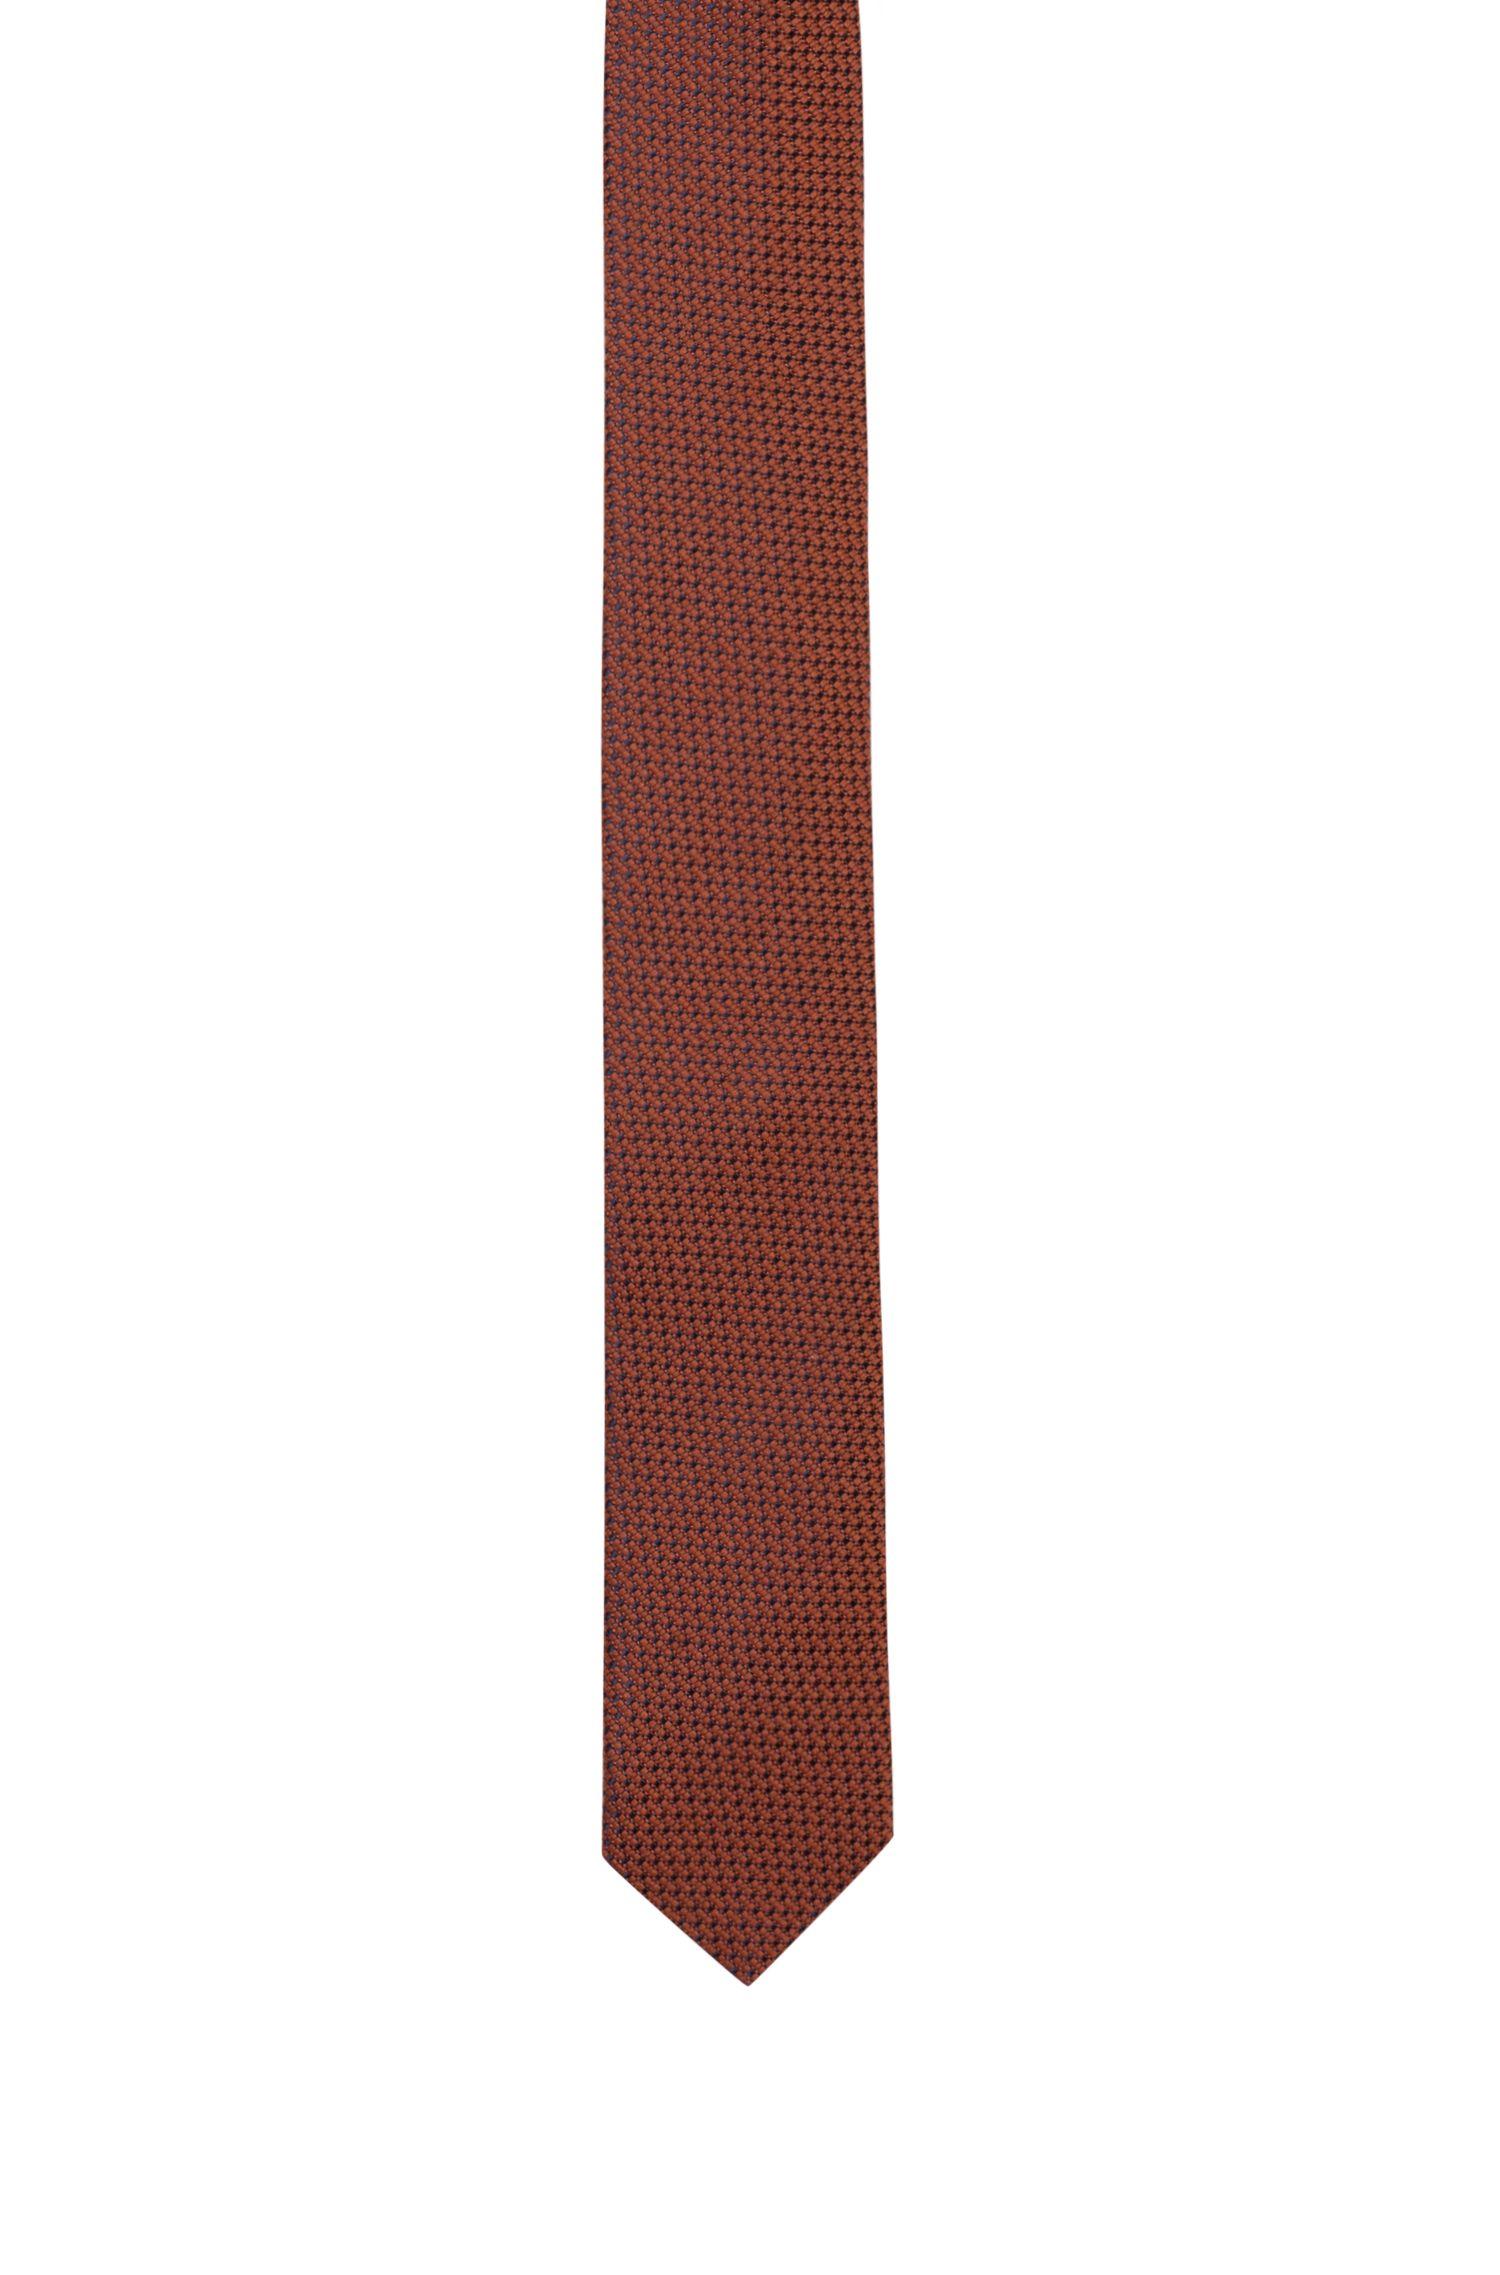 Jacquard-Krawatte aus Woll-Mix mit dezentem Muster, Orange